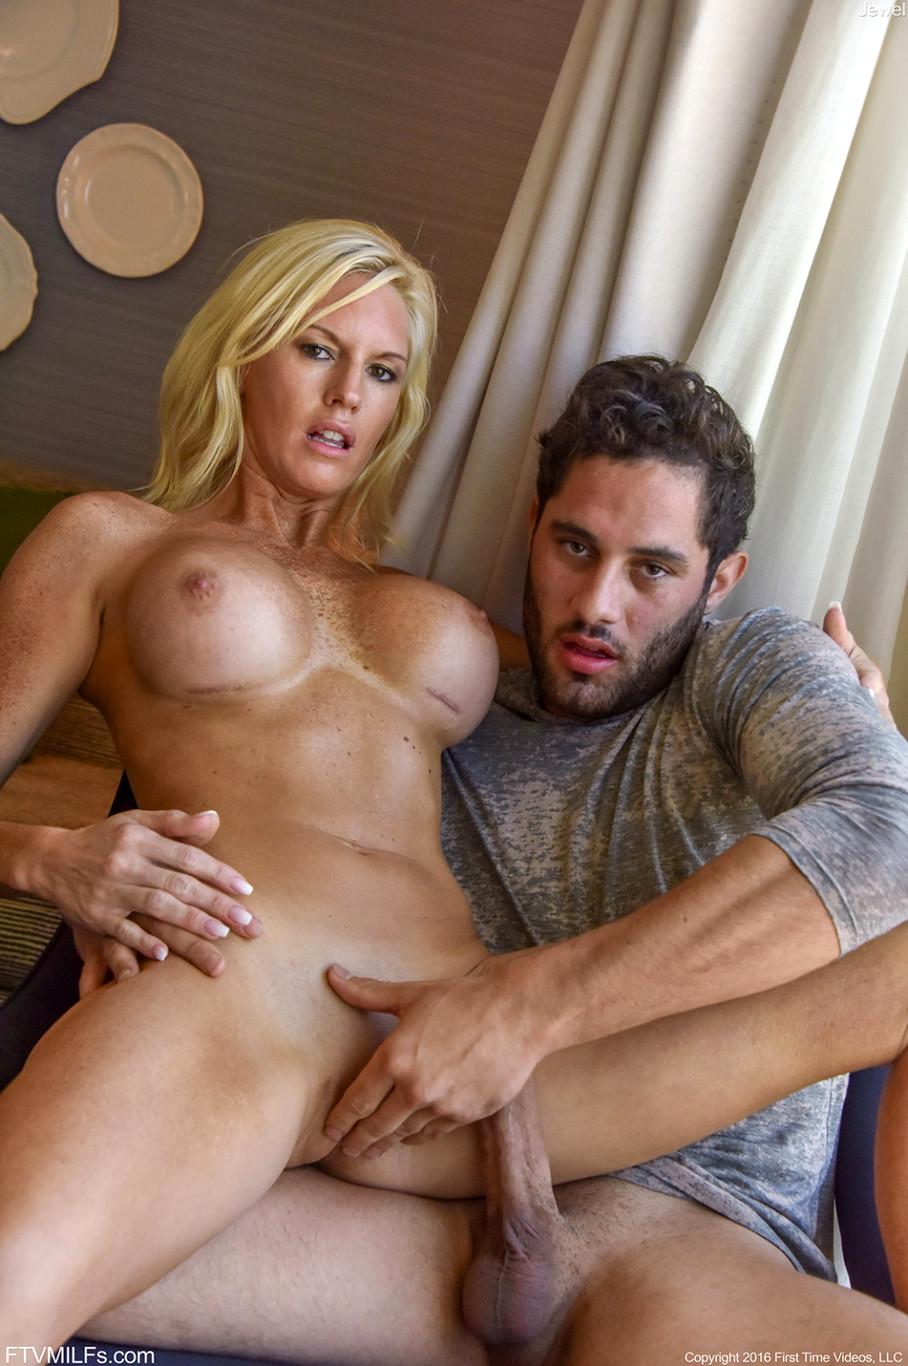 Sex Hd Mobile Pics Ftv Milfs Jewel Average Big Tits Youporn-3394